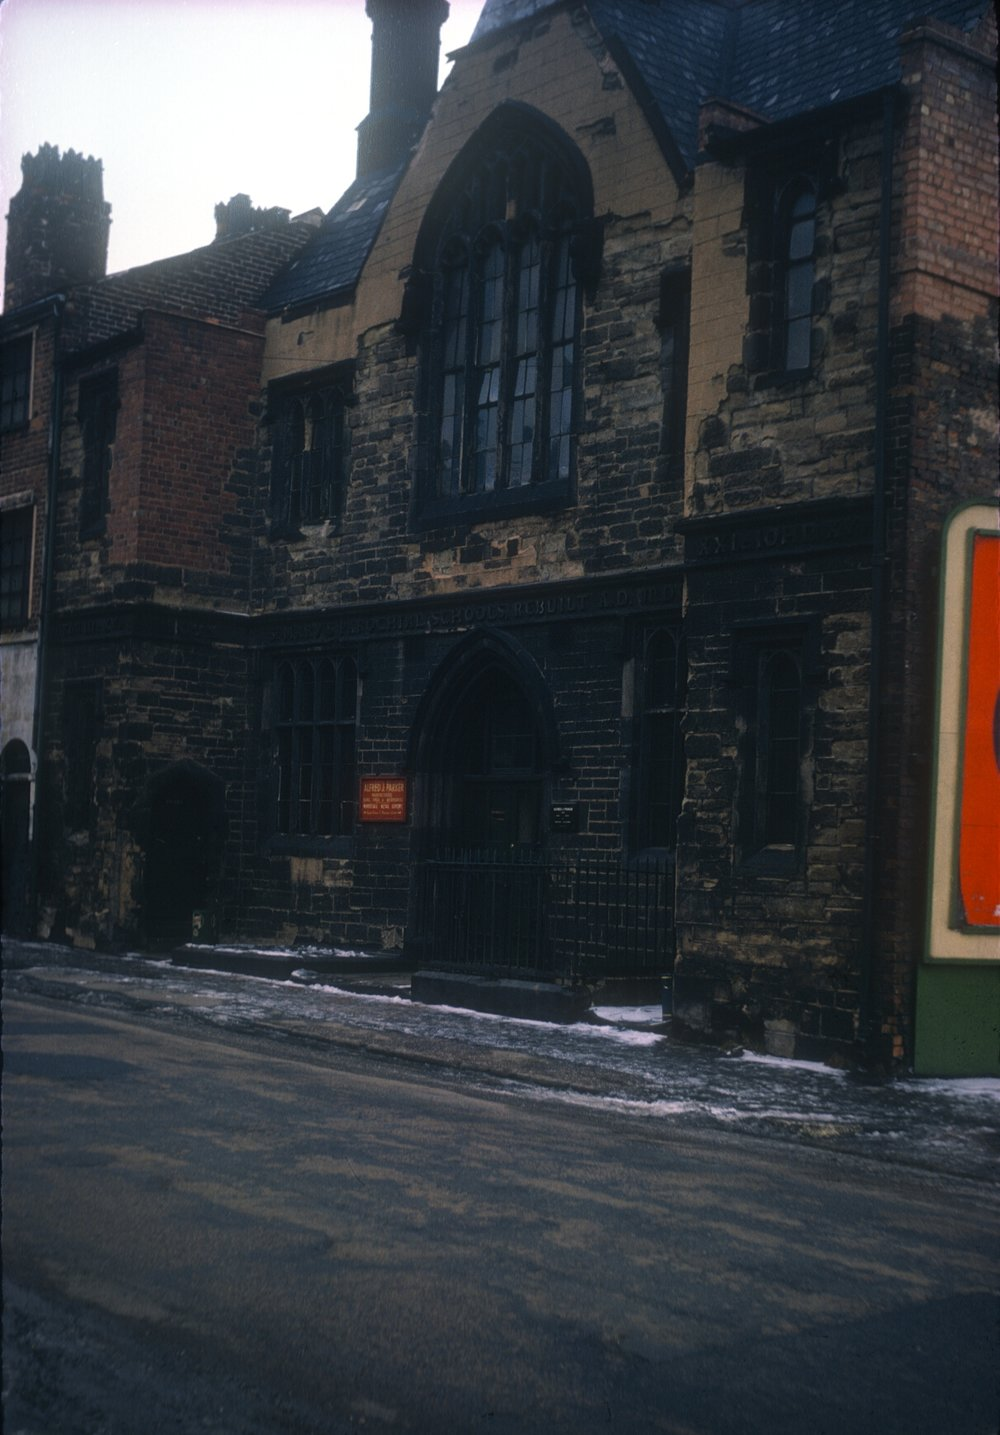 Gun Quarter Bath Street, St. Mary's Parochial Schools (Rebuilt 1845). Later Alfred J Parker - Manufacturer of guns, rifles and accessories. 13th February 1963